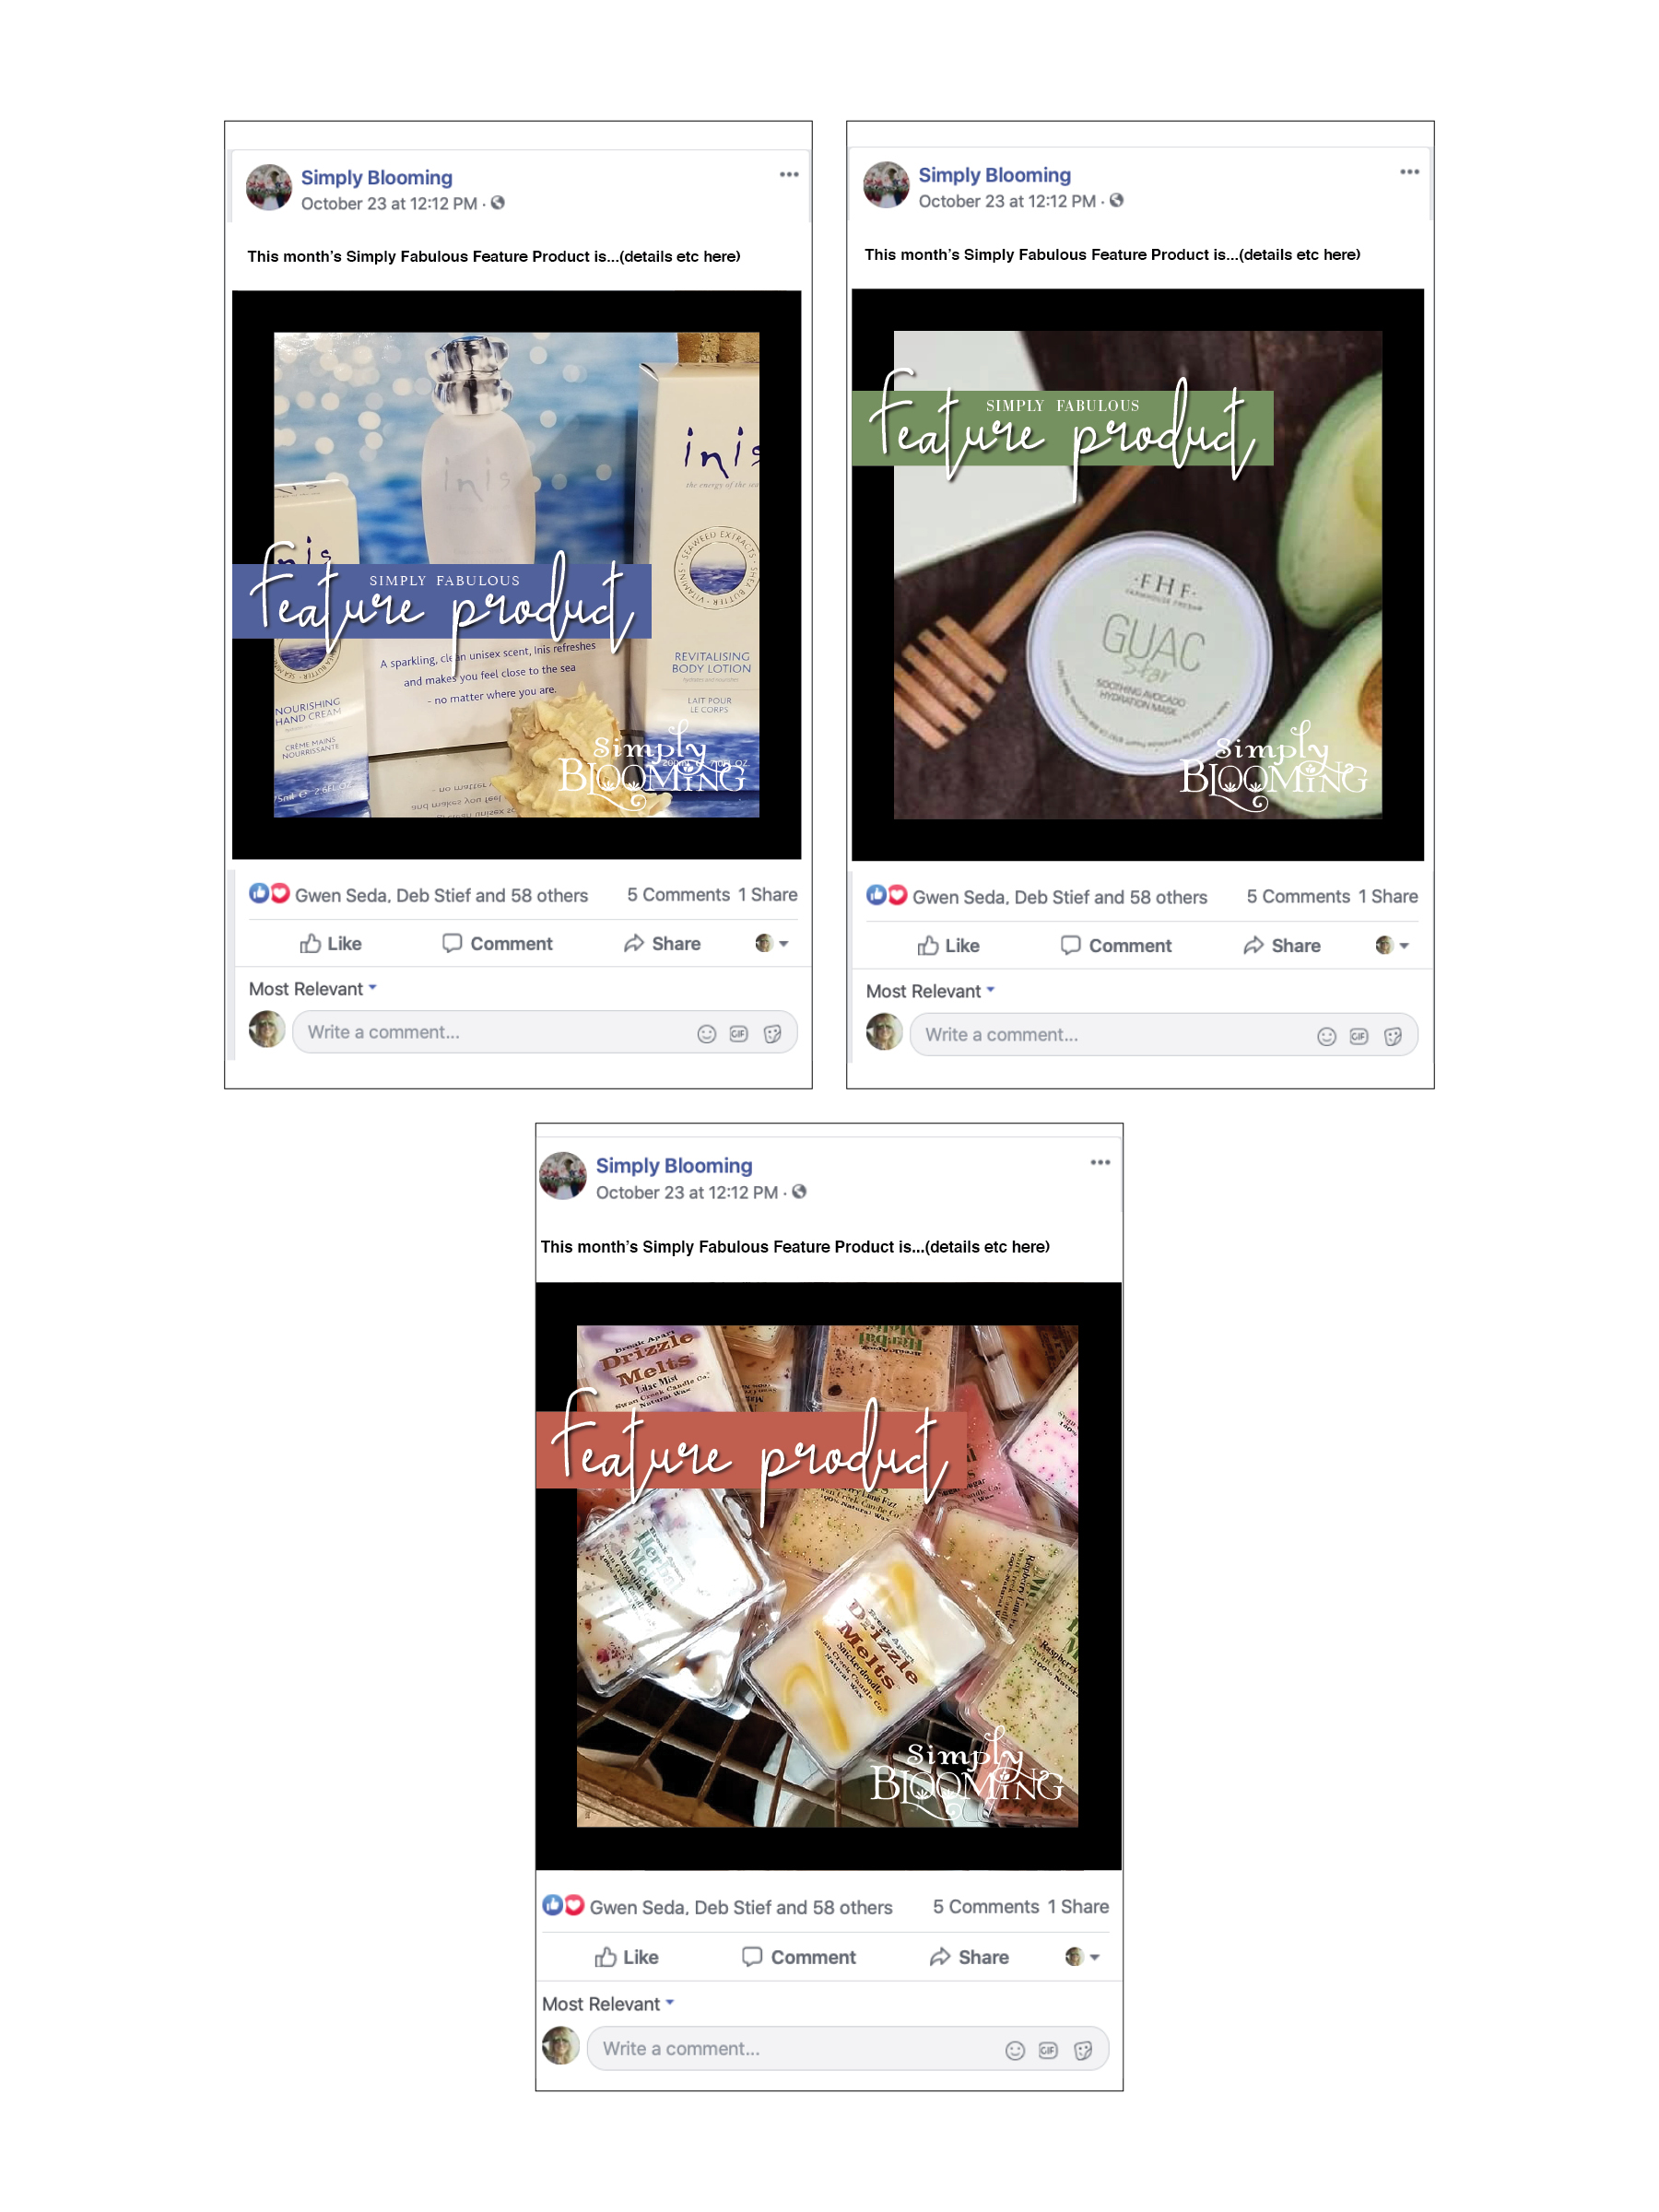 Chick Studios - Social Media Campaign